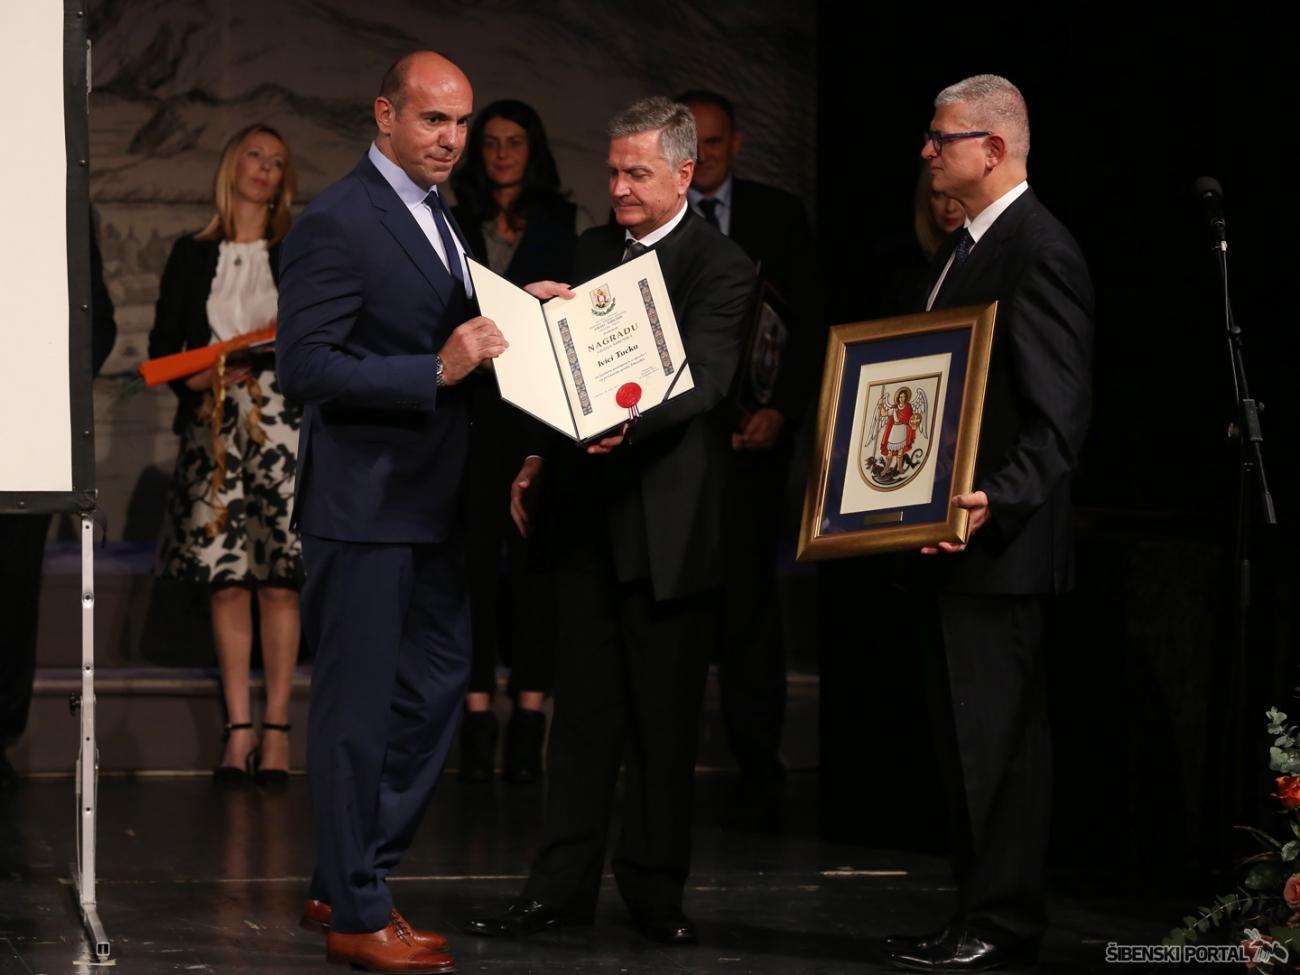 nagrada grada sibenika 280917 12